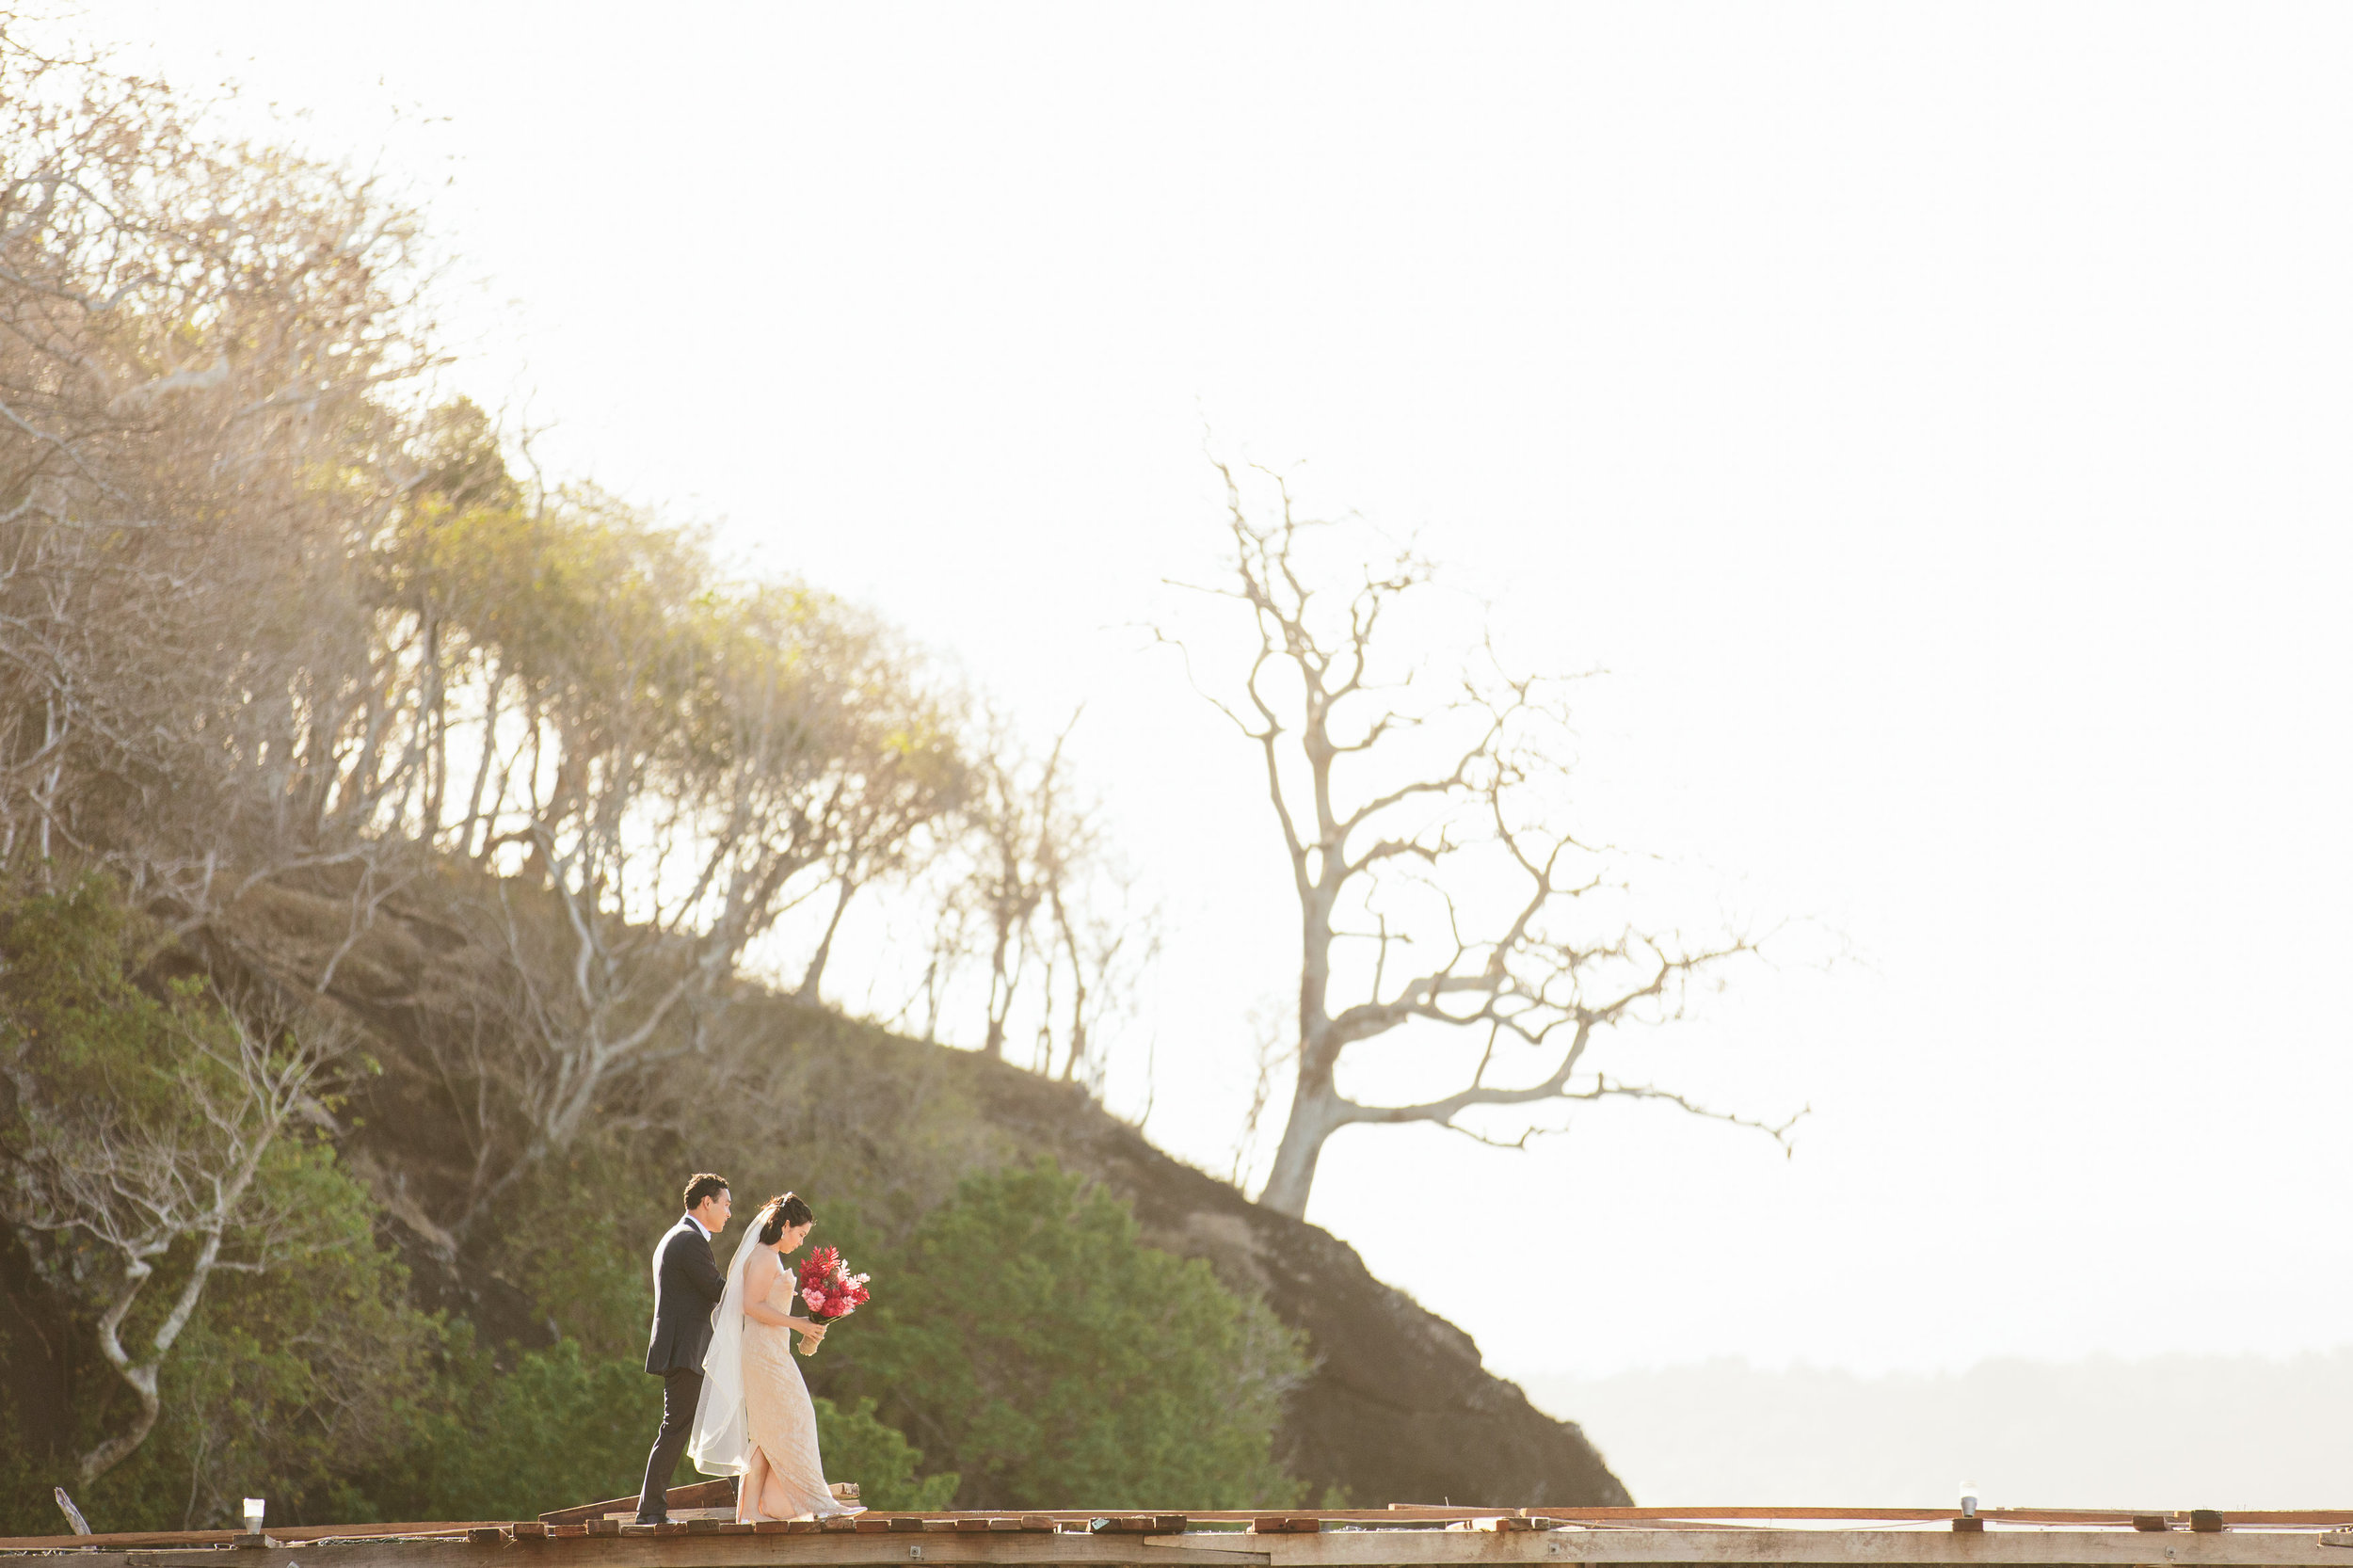 Fiji Wedding Ceremony - Fiji Beach Wedding Elopement - The Remote Resort Fiji Islands